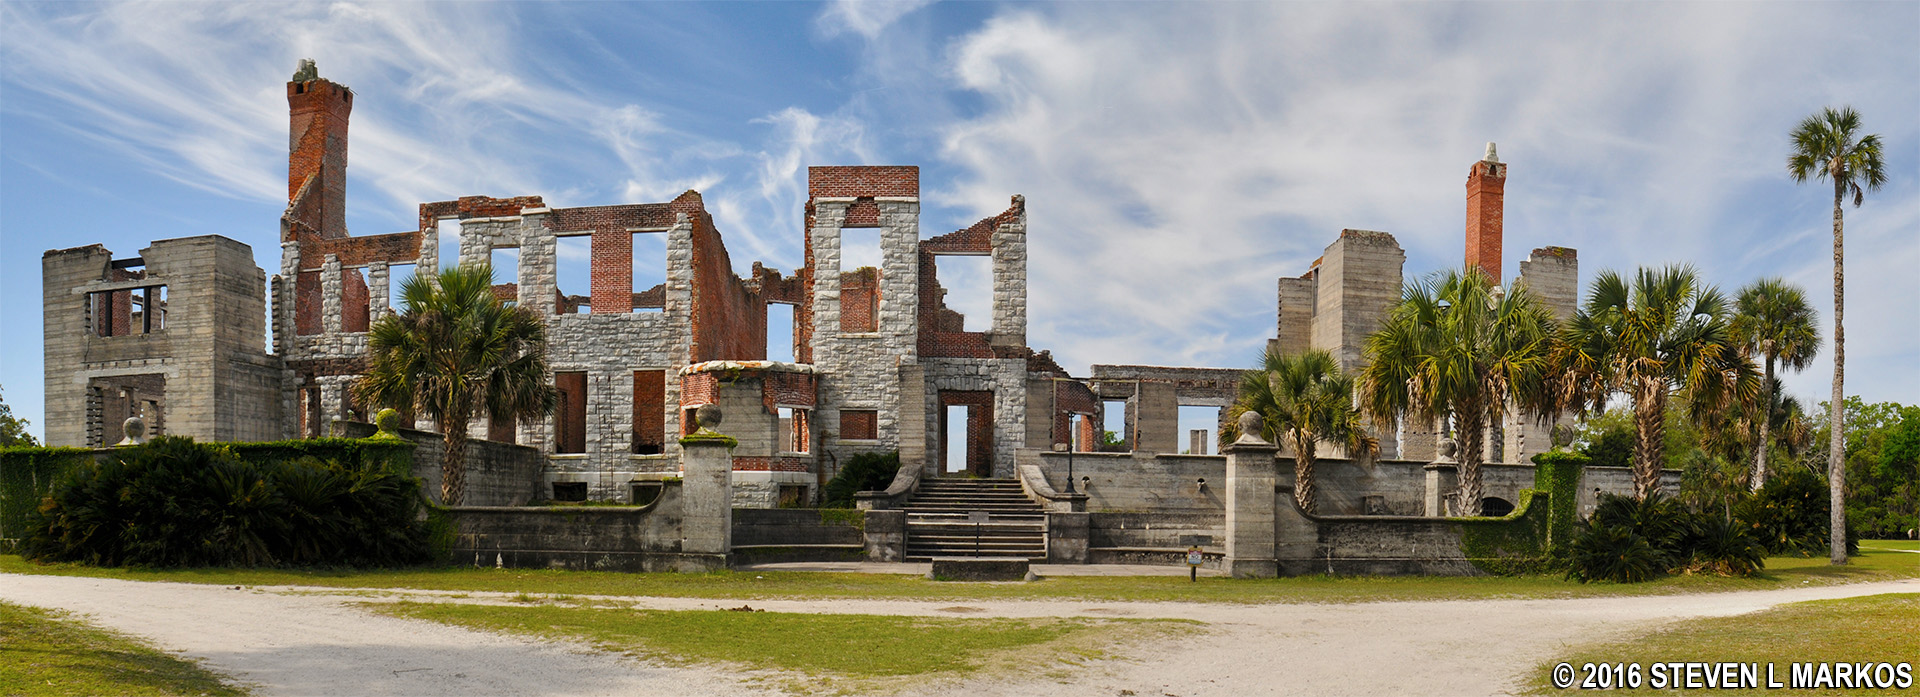 Cumberland Island National Seashore Dungeness Mansion